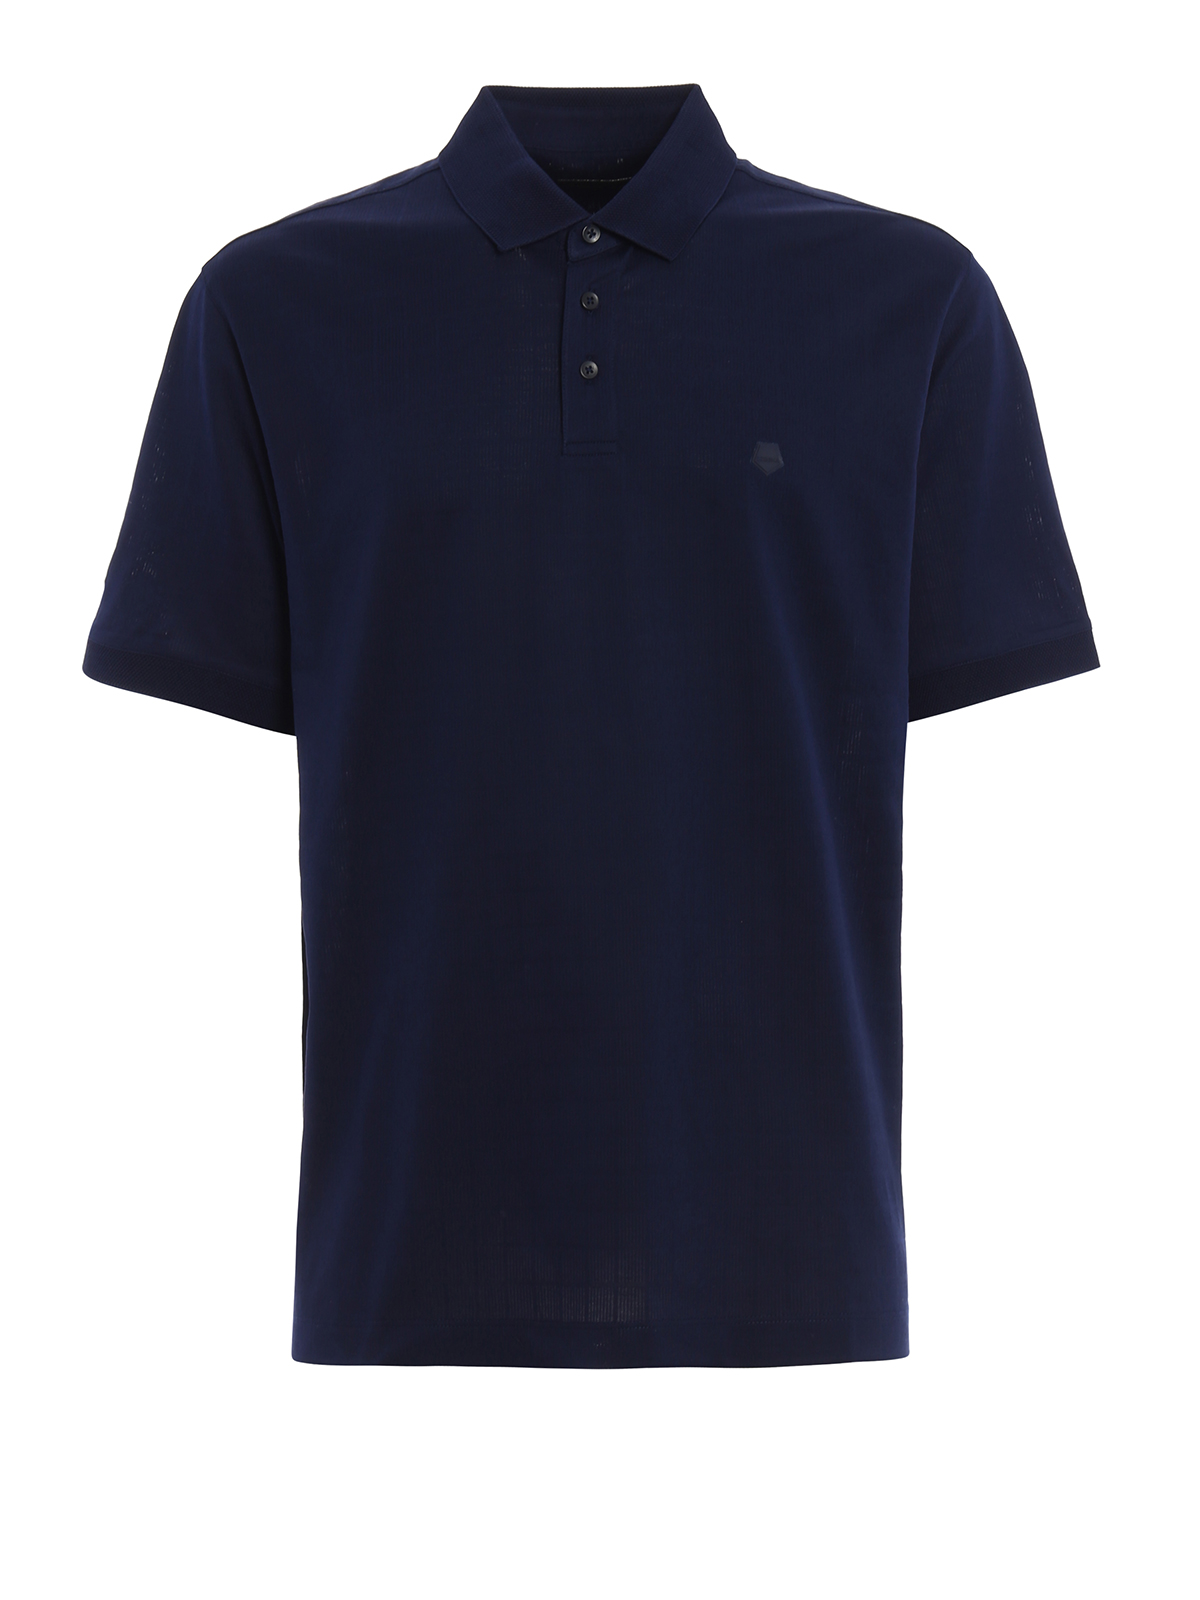 Micro pattern jersey polo shirt by z zegna polo shirts for Zegna polo shirts sale